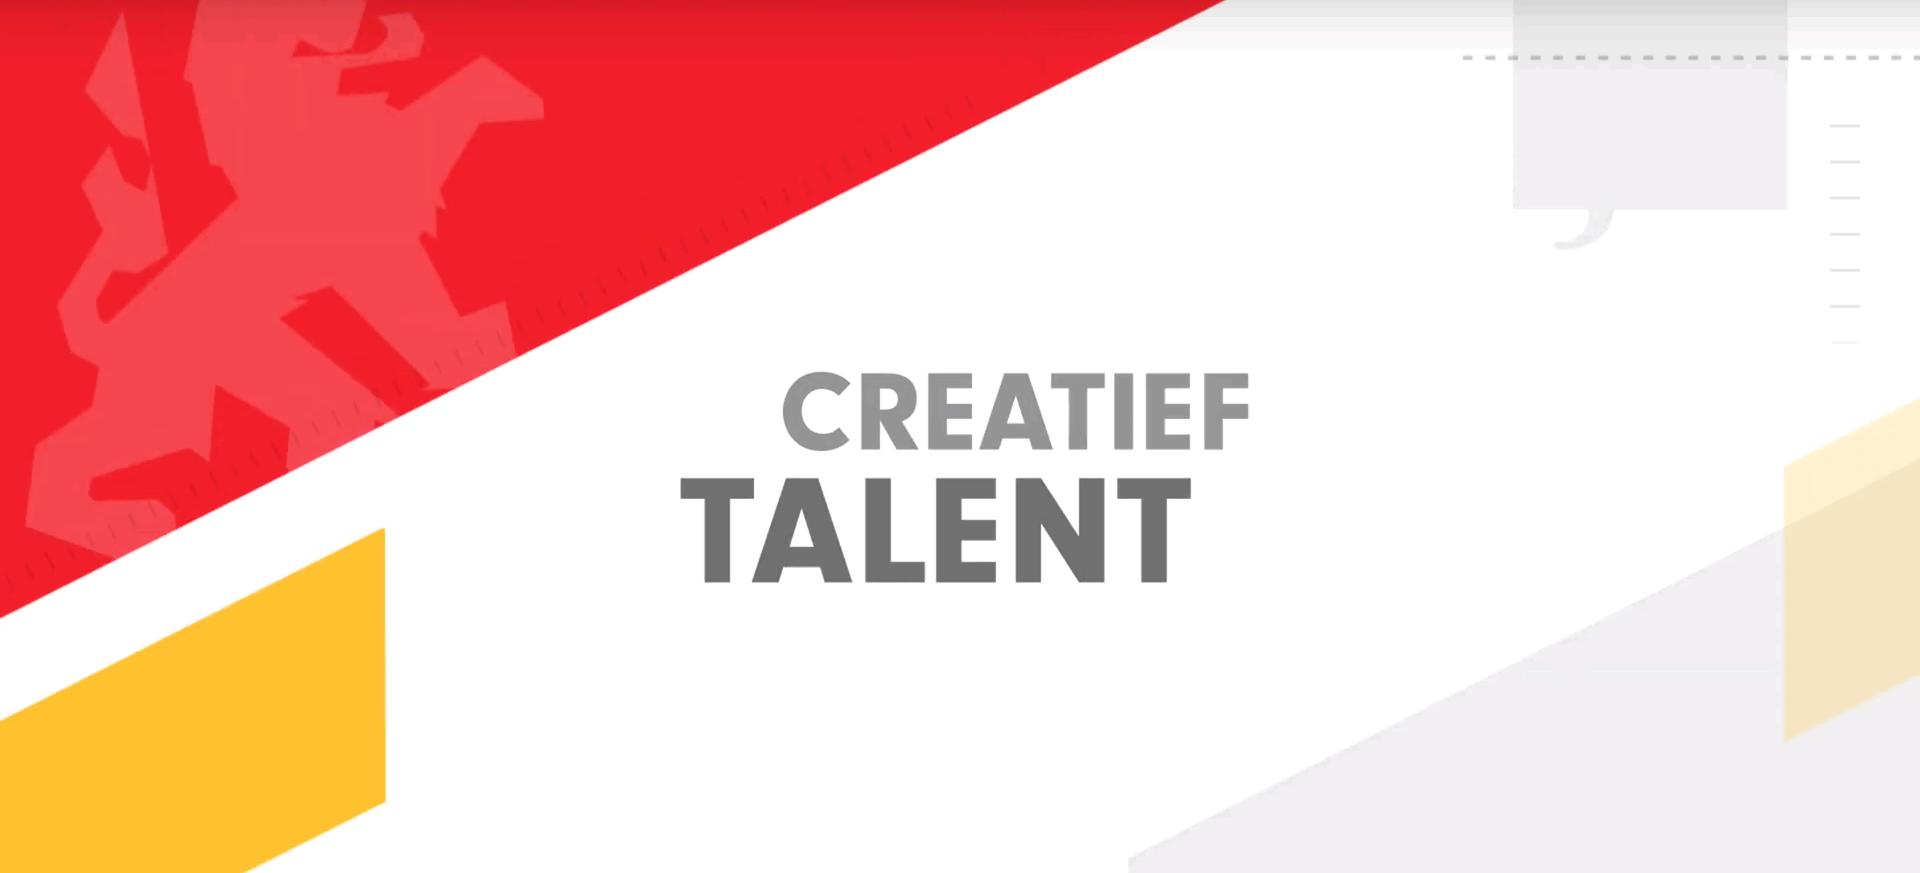 Goud van Brabant | Creatief Talent: Stephanie Bakker en Lydia Halders & Spiritbox